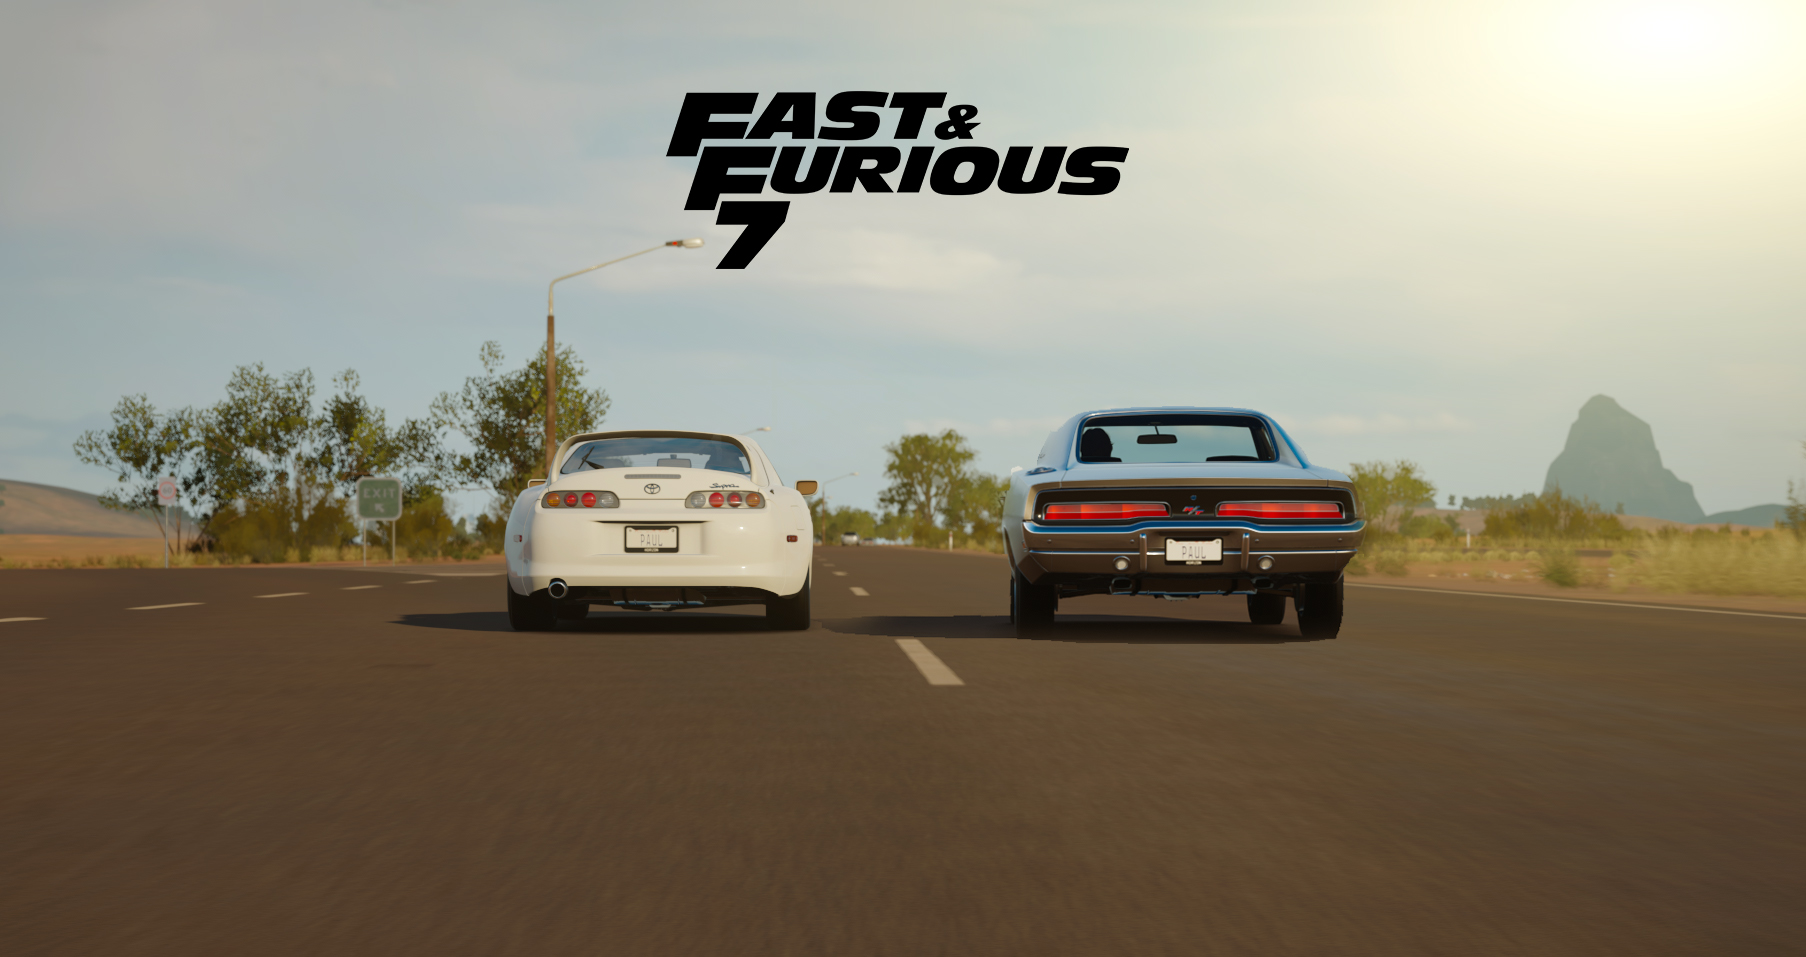 Forza Horizon 3 Fast & Furious 7